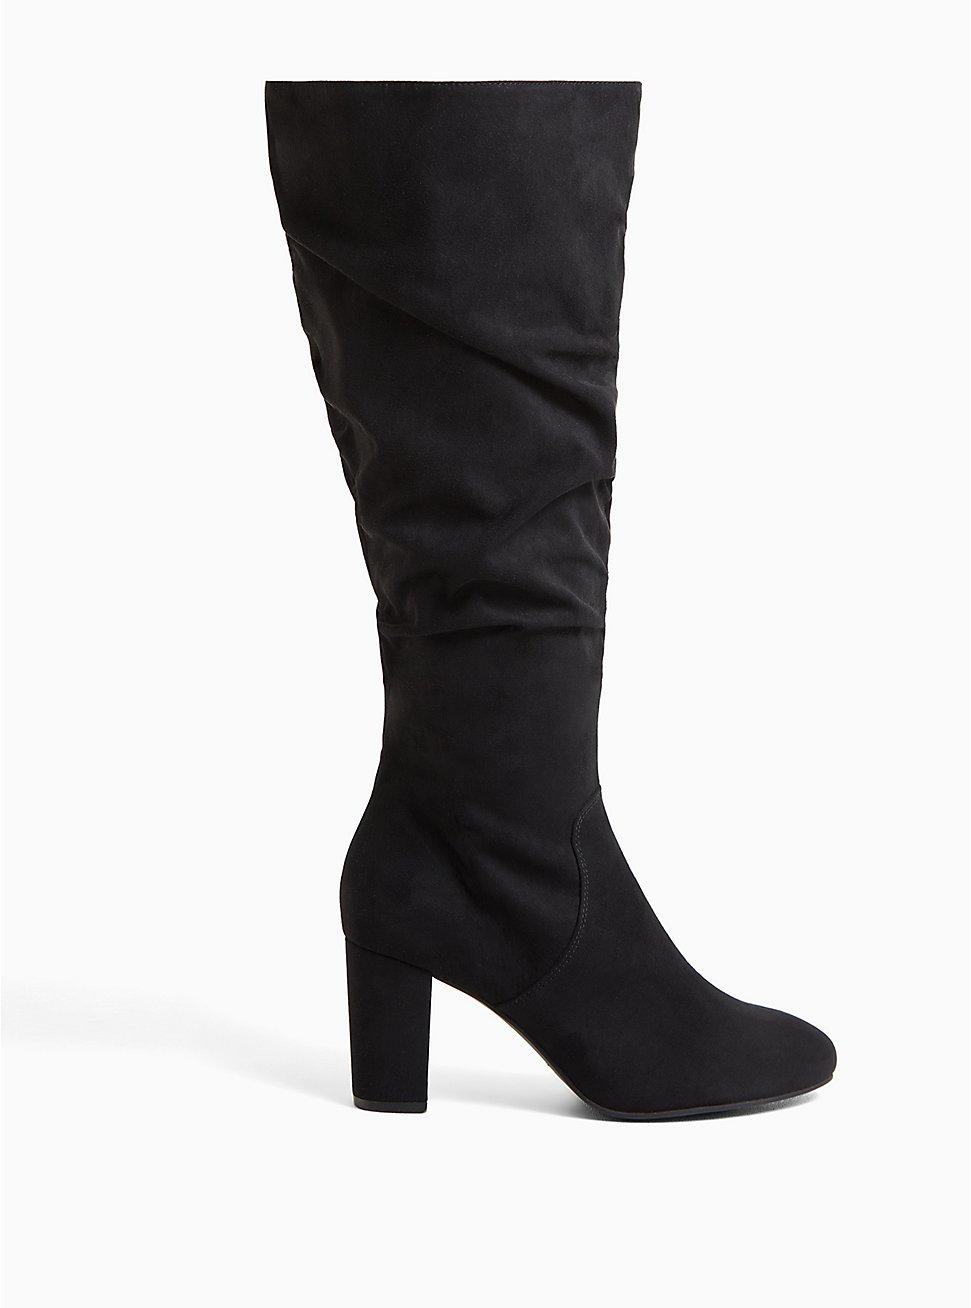 Black Faux Suede Scrunch Block Heel Knee-High Boot (WW), BLACK, hi-res